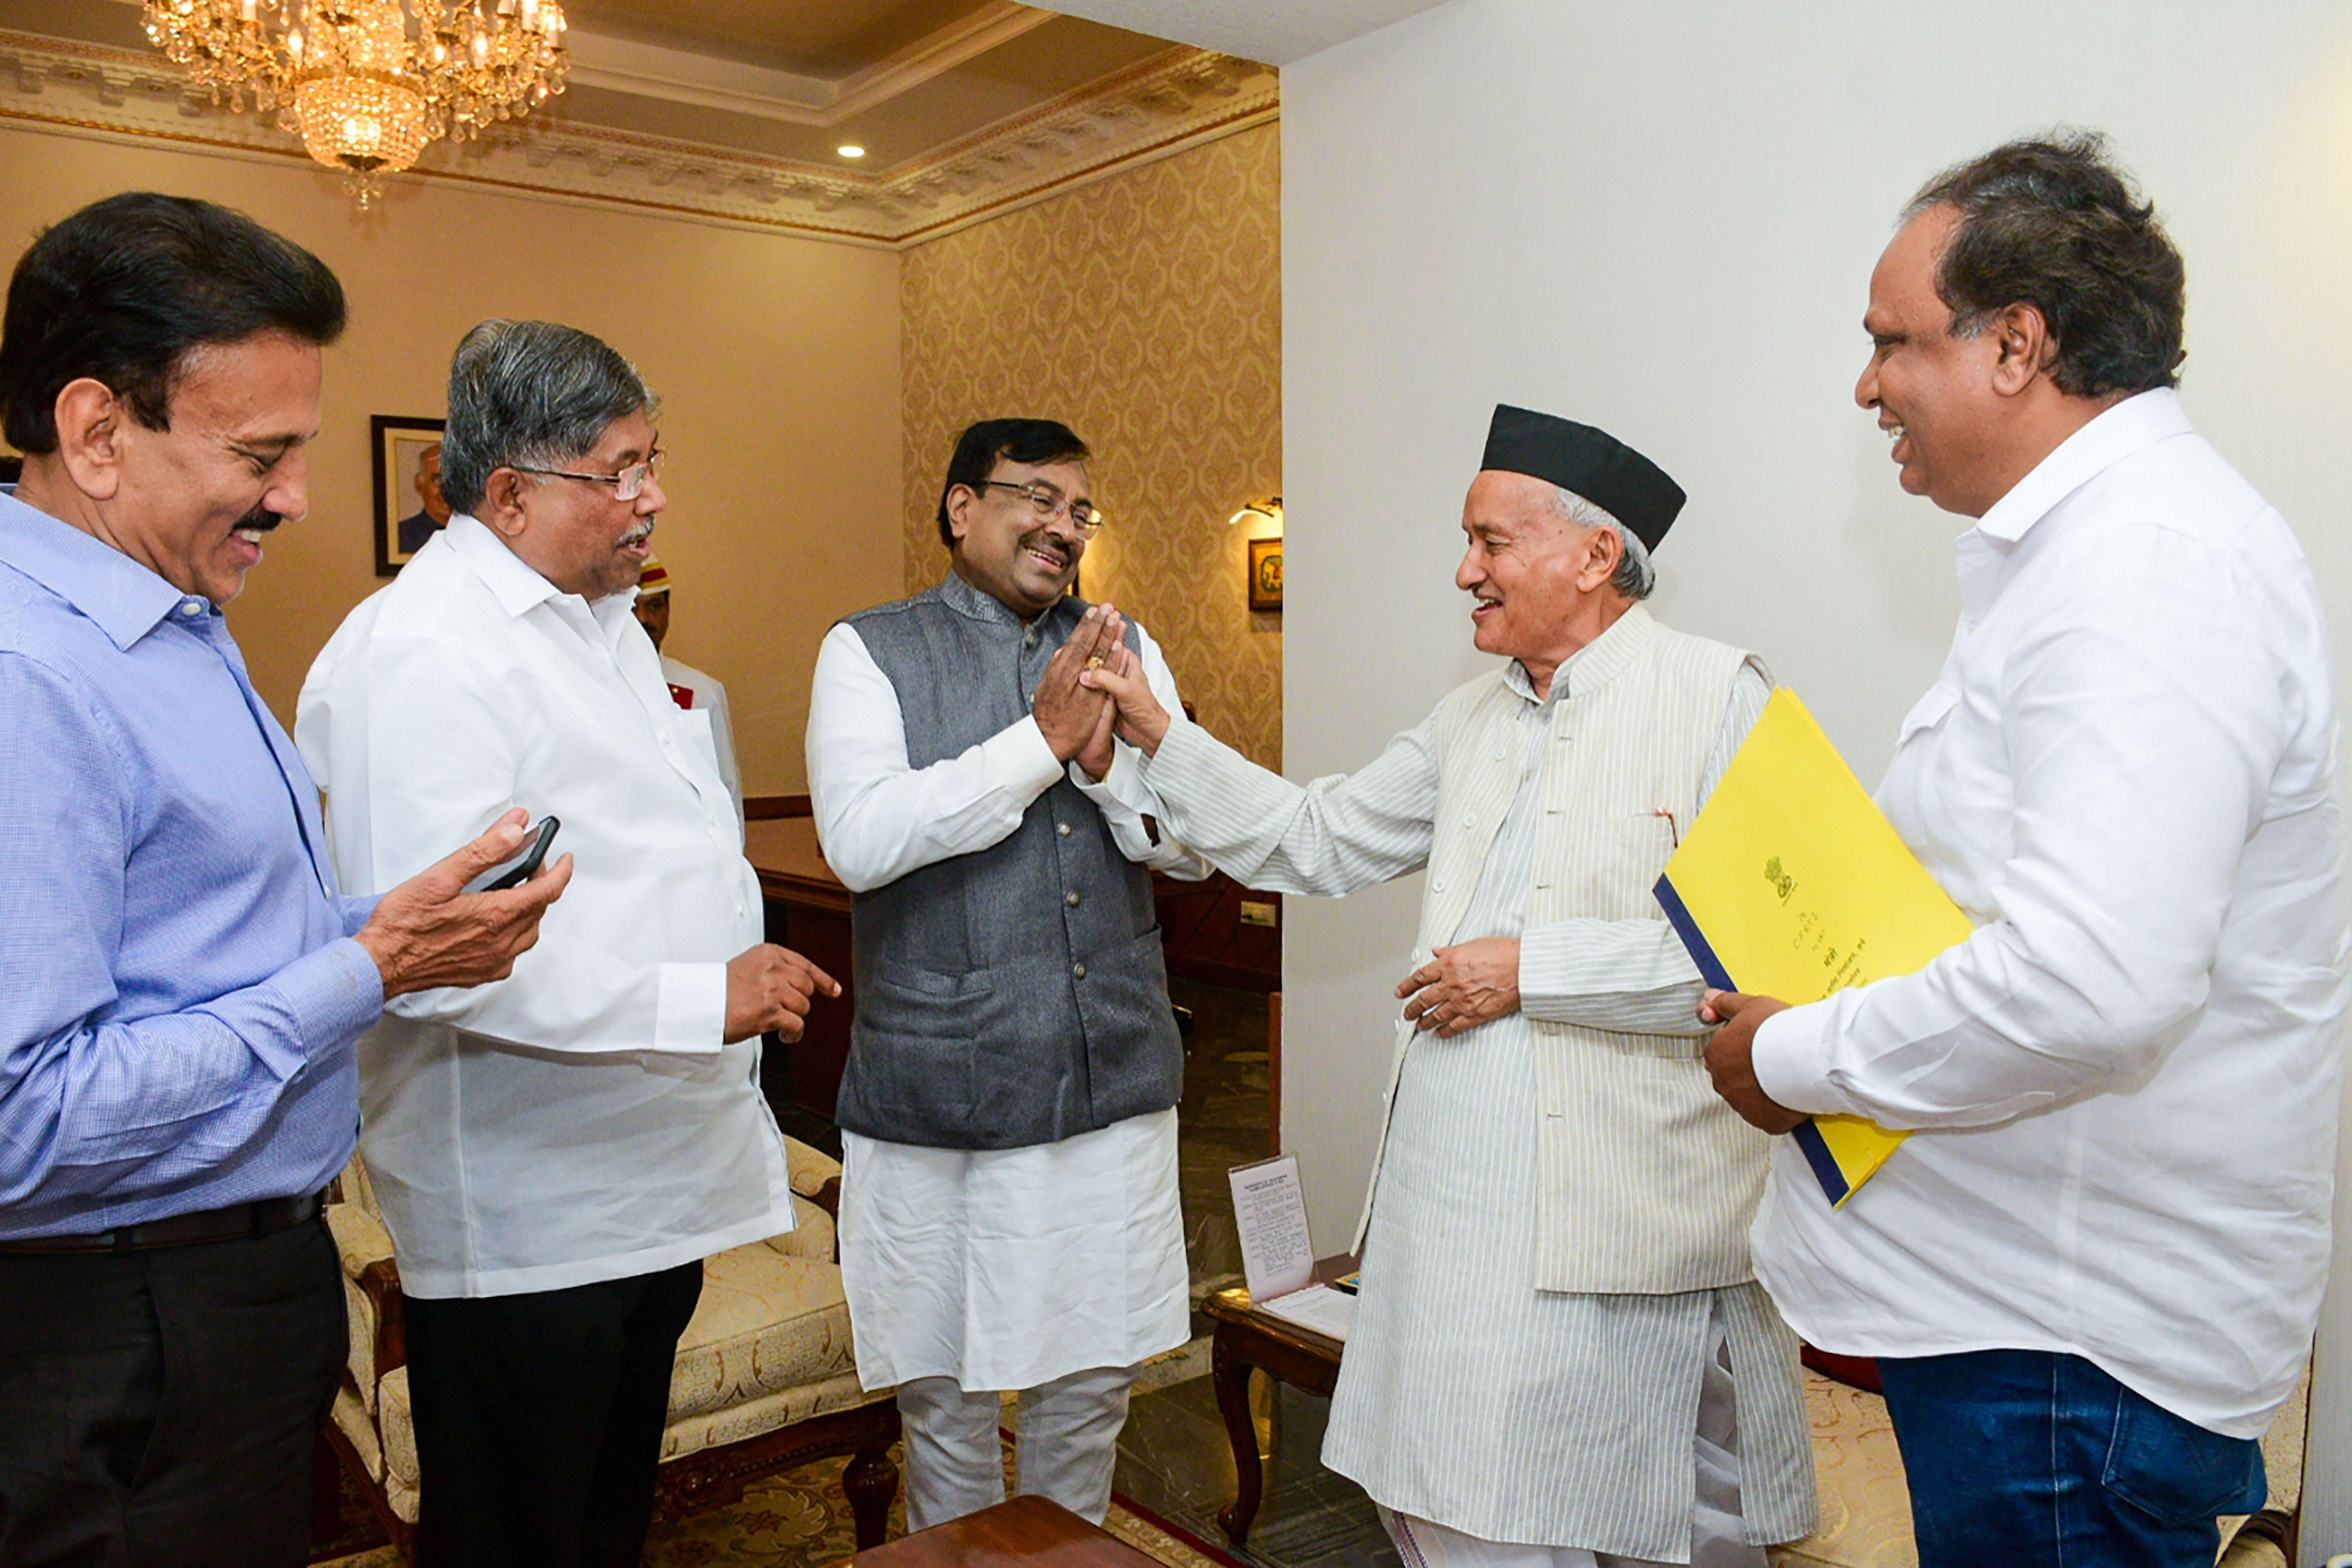 In this November 7, 2019, photo, Maharashtra governor Bhagat Singh Koshyari meets with senior BJP leader Chandrakant Patil (2nd Left), Sudhir Mungantiwar (Centre) and others, at Raj Bhawan in Mumbai on Thursday.